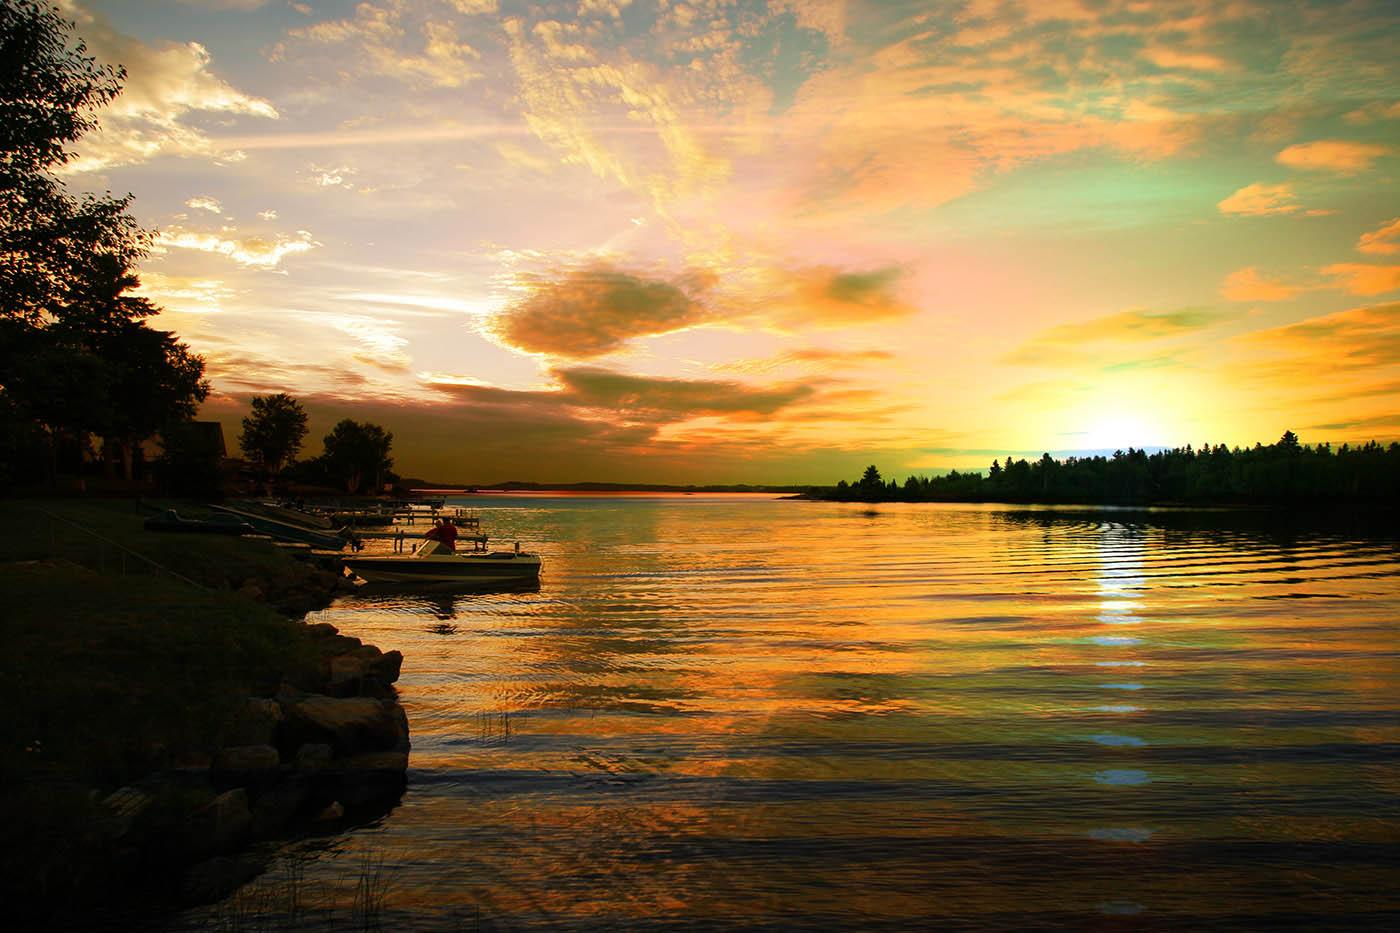 Perfect Sunset Lake - Royalty-Free Stock Imagery